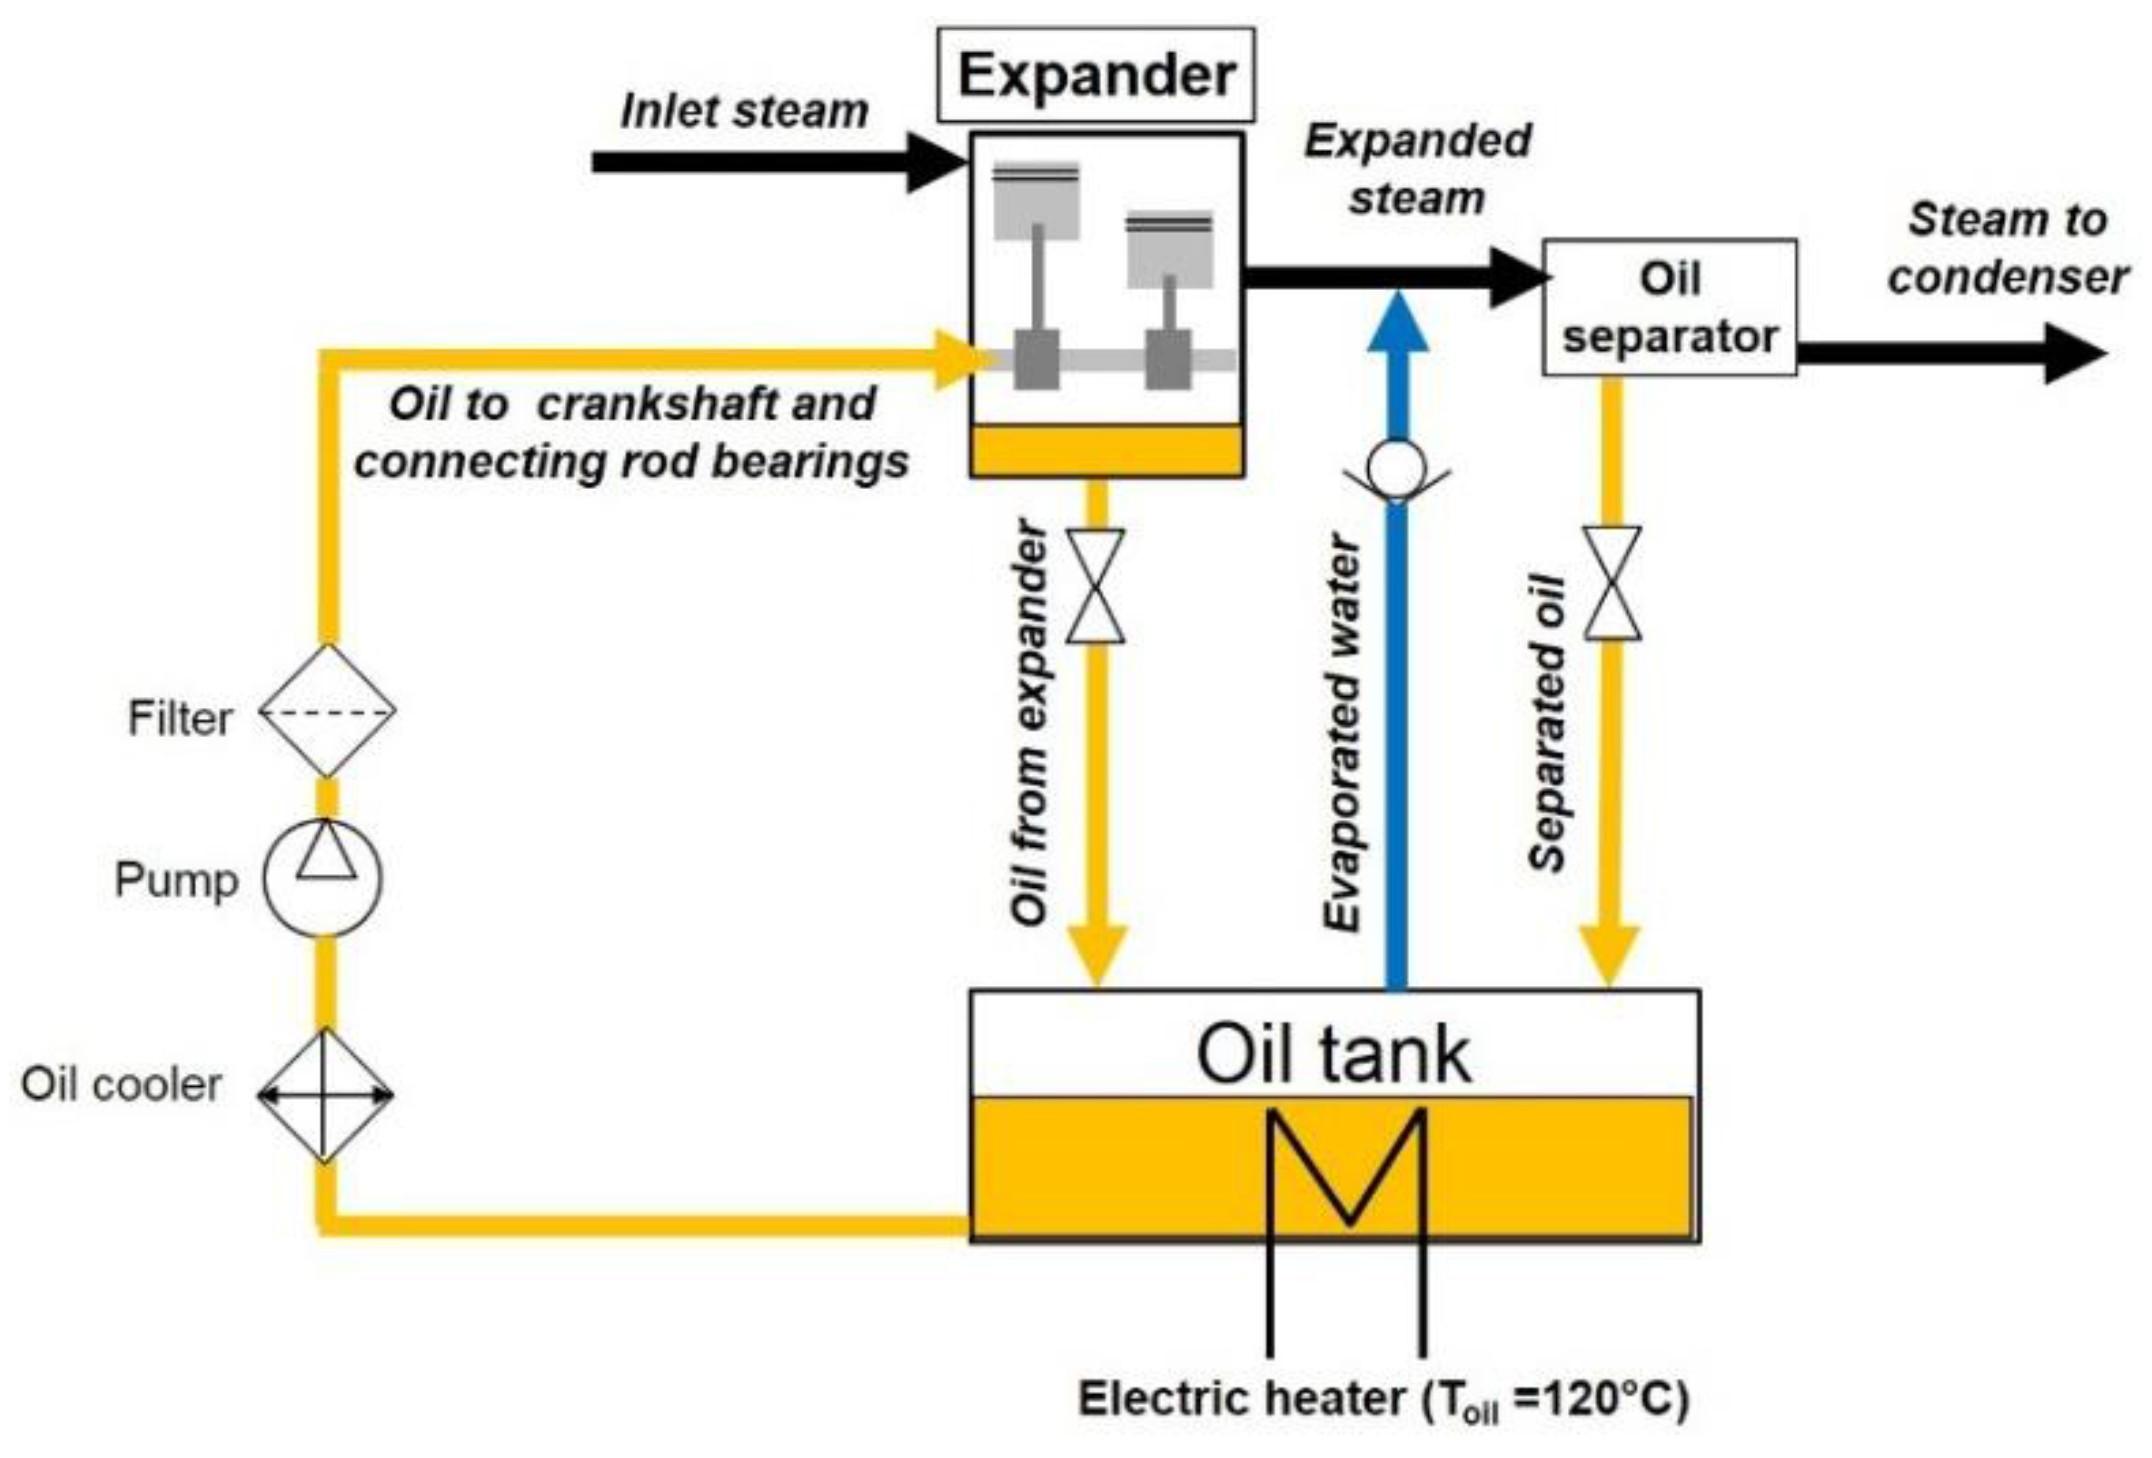 Engine Lubrication System Diagram Energies Free Full Text Of Engine Lubrication System Diagram